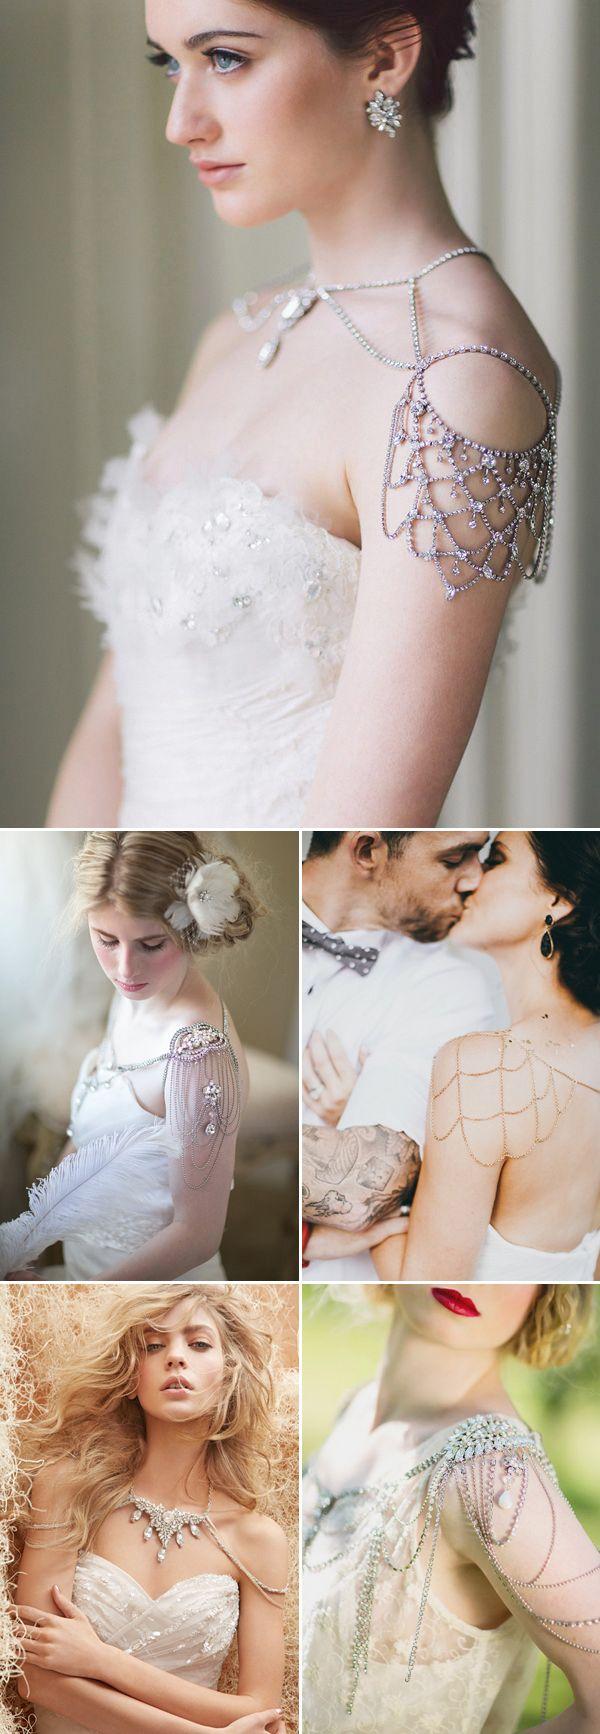 http://rubies.work/0435-sapphire-ring/ Fantastic shoulder necklaces for your wedding. Let's talk about some bling girl Comment/gemjunkiejewels Via:praise wedding.com